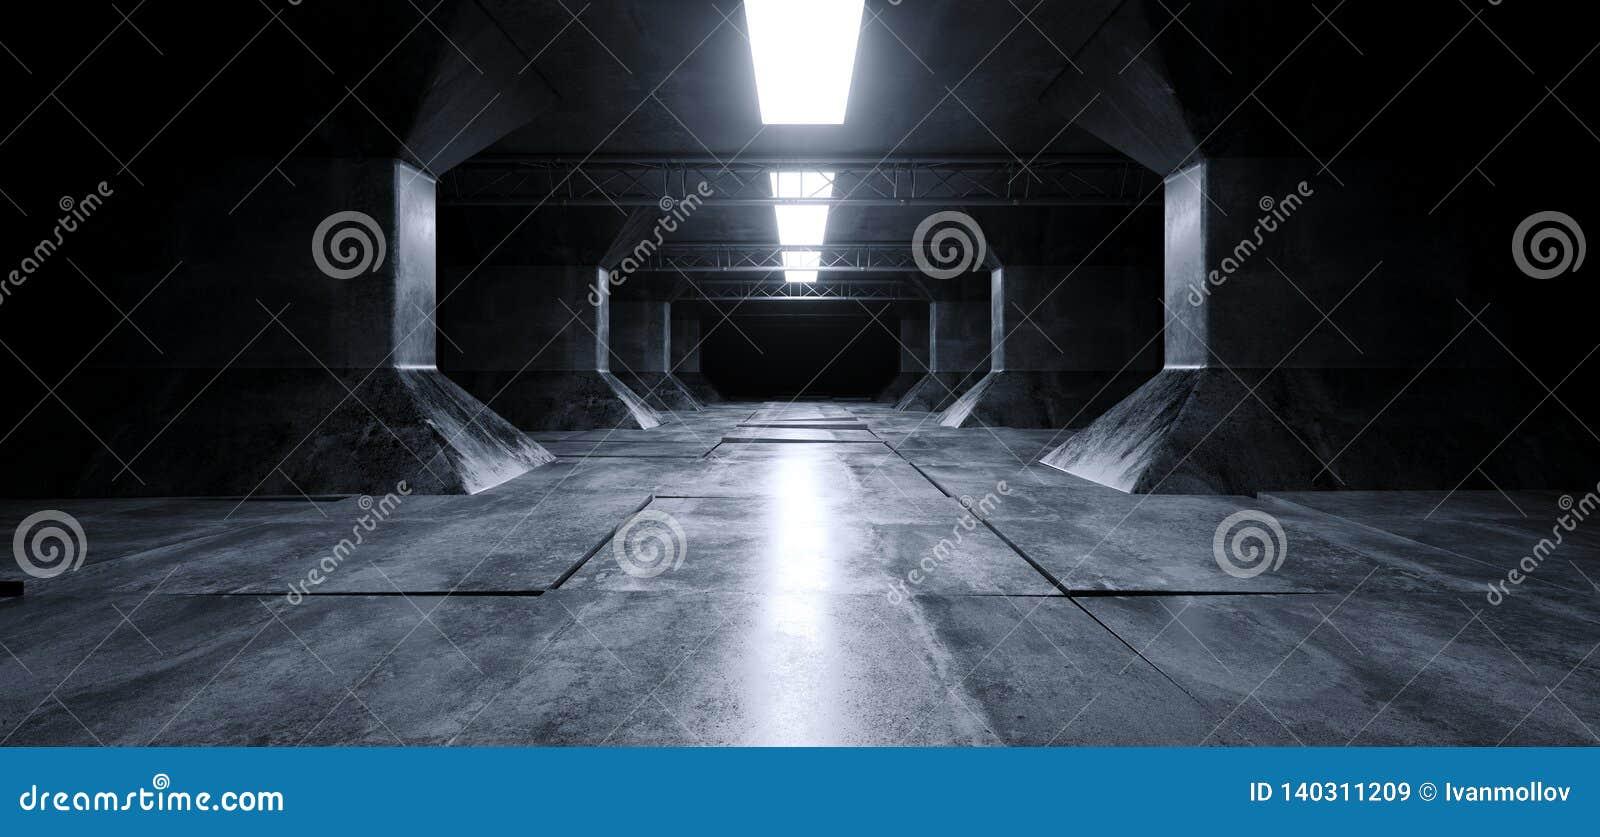 Sci Fi Futuristic Alien Ship Grunge Concrete Reflective Columns Corridor Spaceship Modern Blue White Neon Glowing Laser Led Tiled